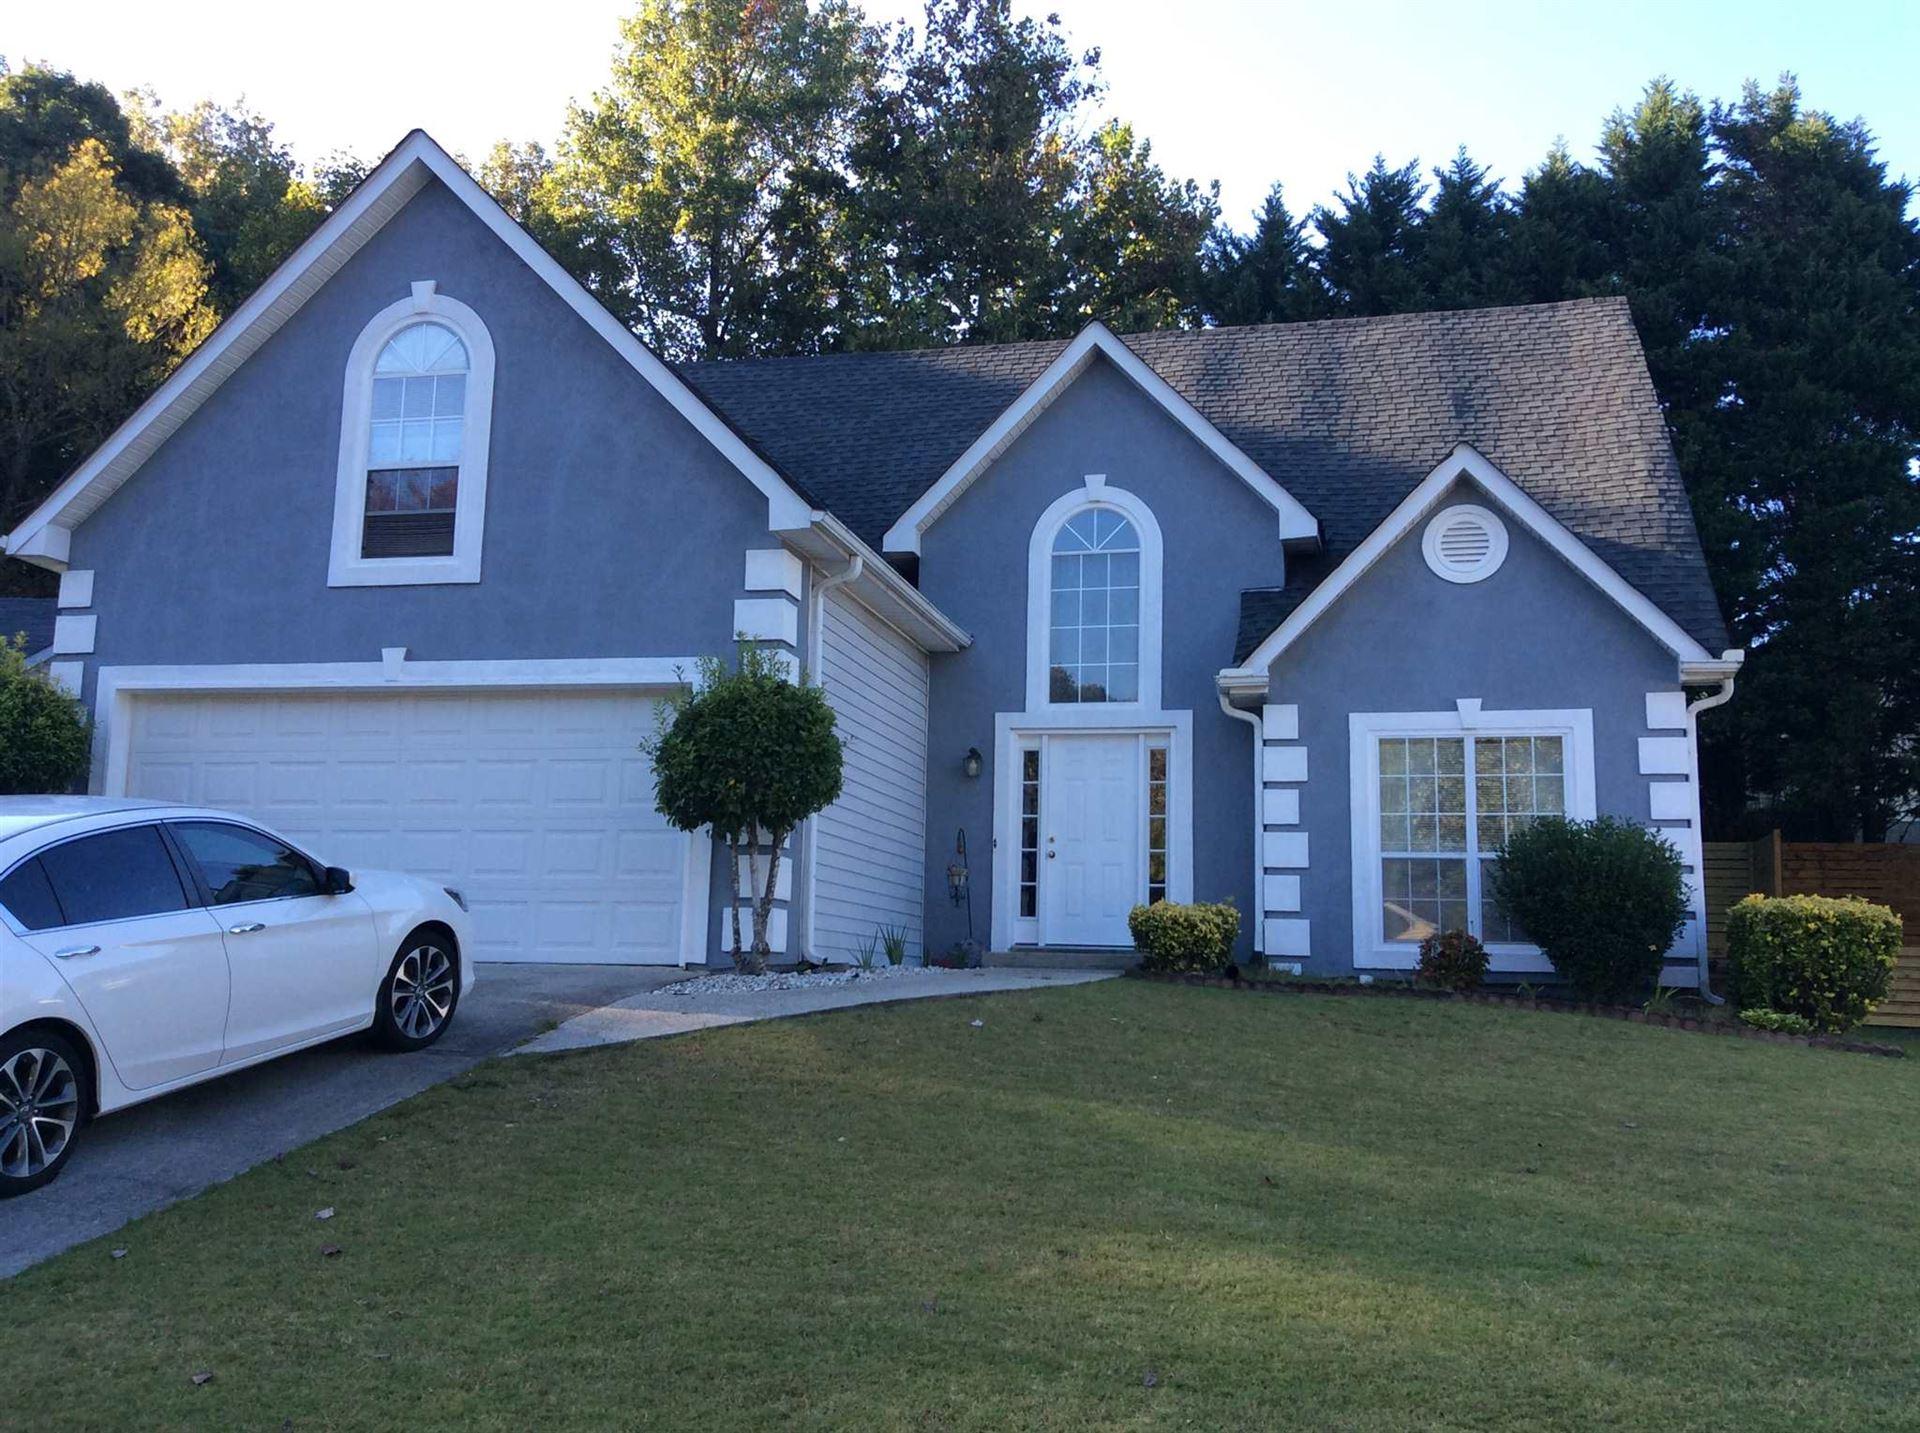 1135 Golden Valley Ct, Lawrenceville, GA 30043 - MLS#: 8878547